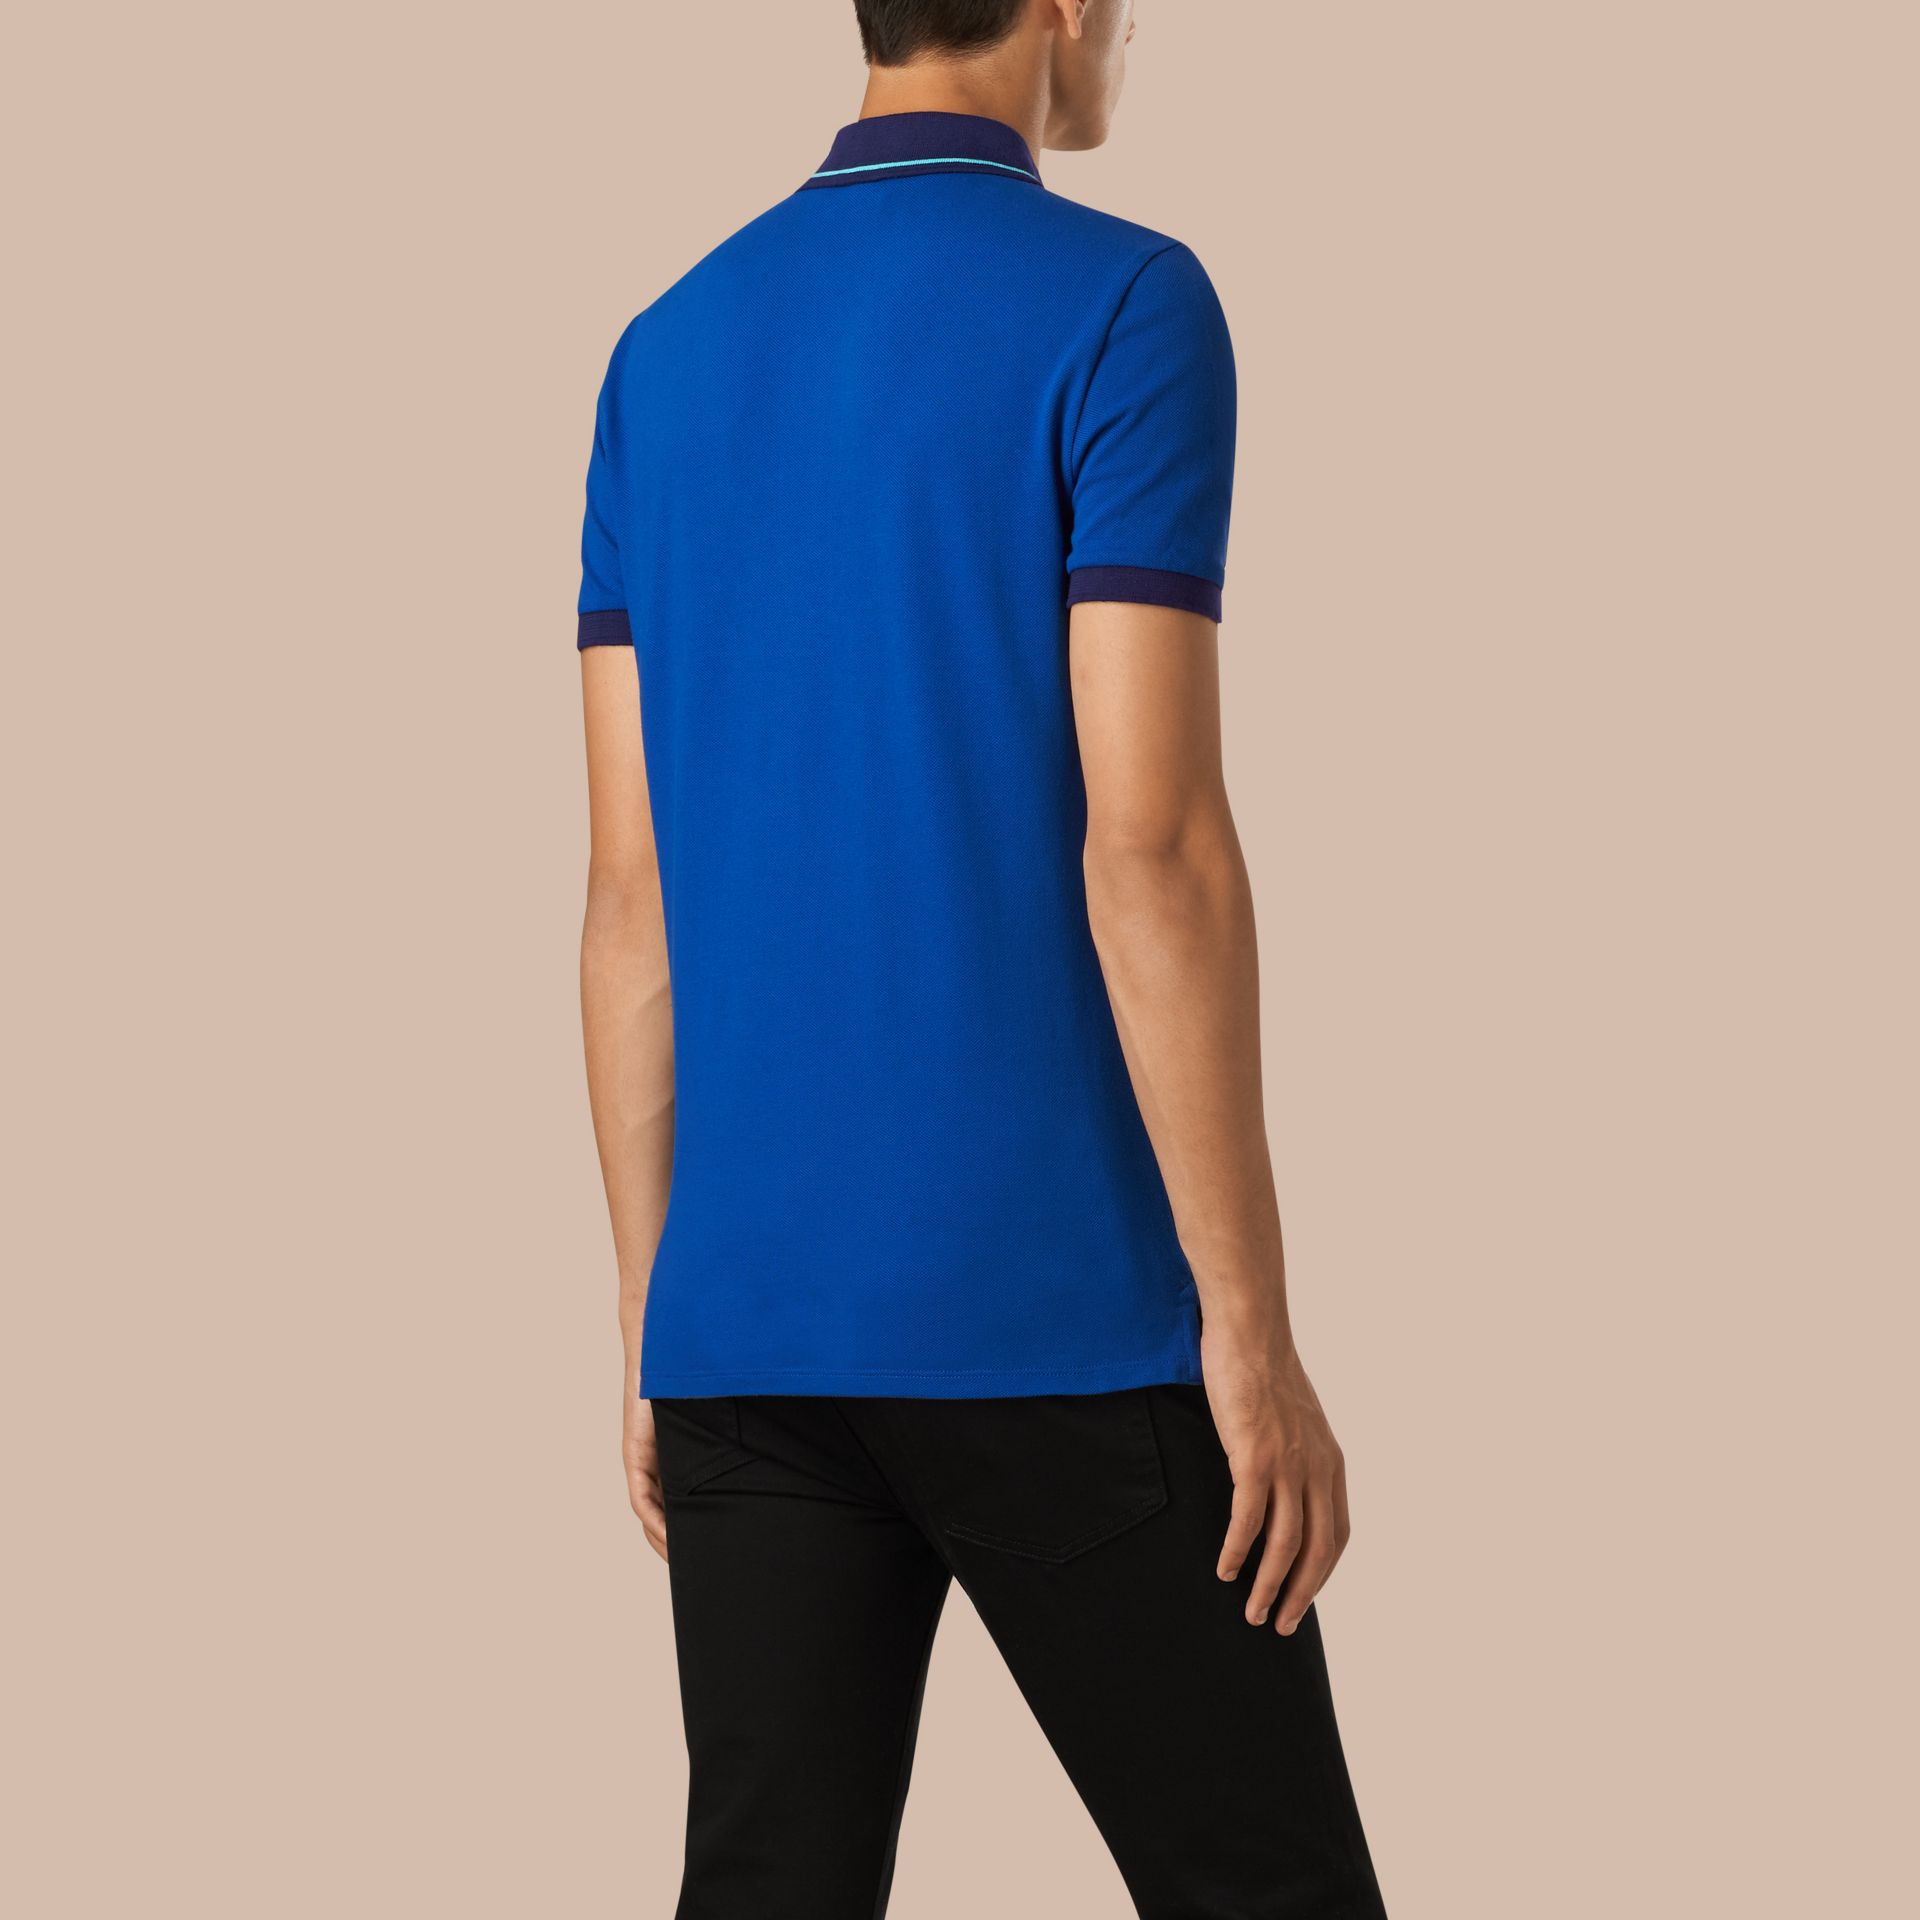 Kobaltblau/helles peridotblau Poloshirt aus Baumwollpiqué mit Kontrastbesatz Kobaltblau/helles Peridotblau - Galerie-Bild 2